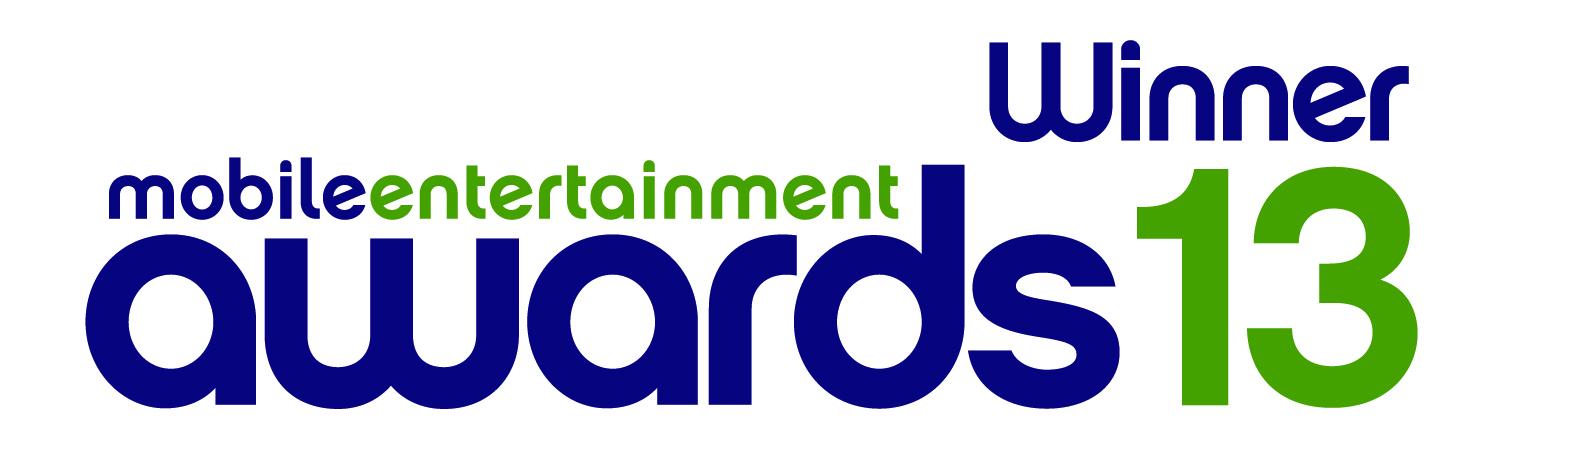 Bango Wins Mobile Entertainment Award 2013 | Bango Newsroom on the ...